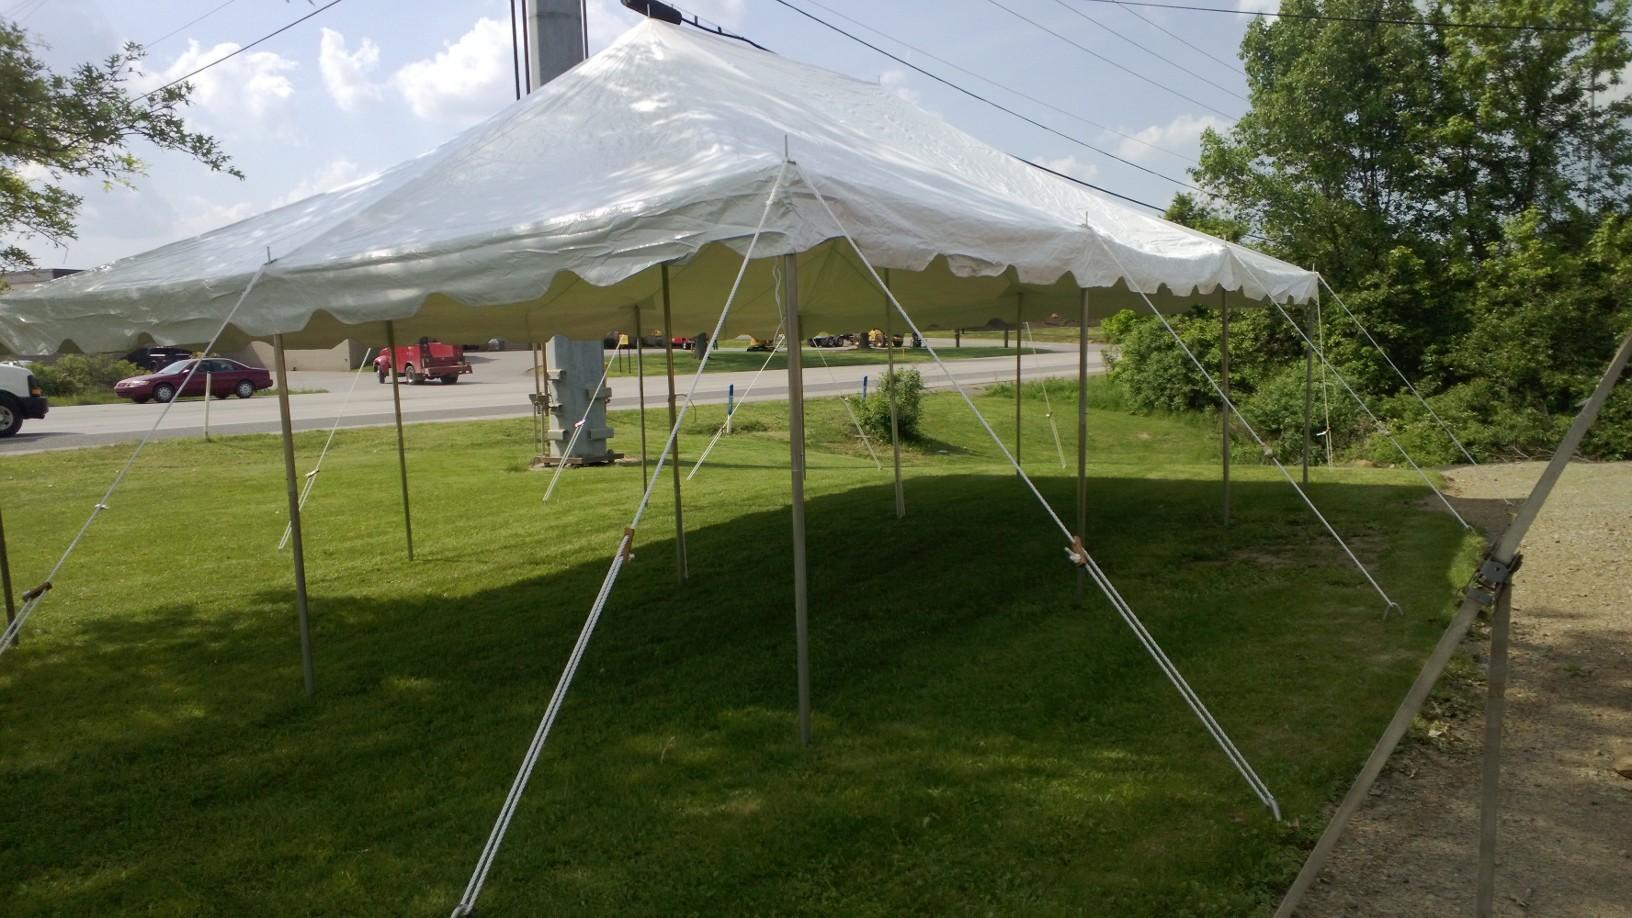 20 x 30 Pole Tent & 20 x 30 Pole Tent | General Rental Center